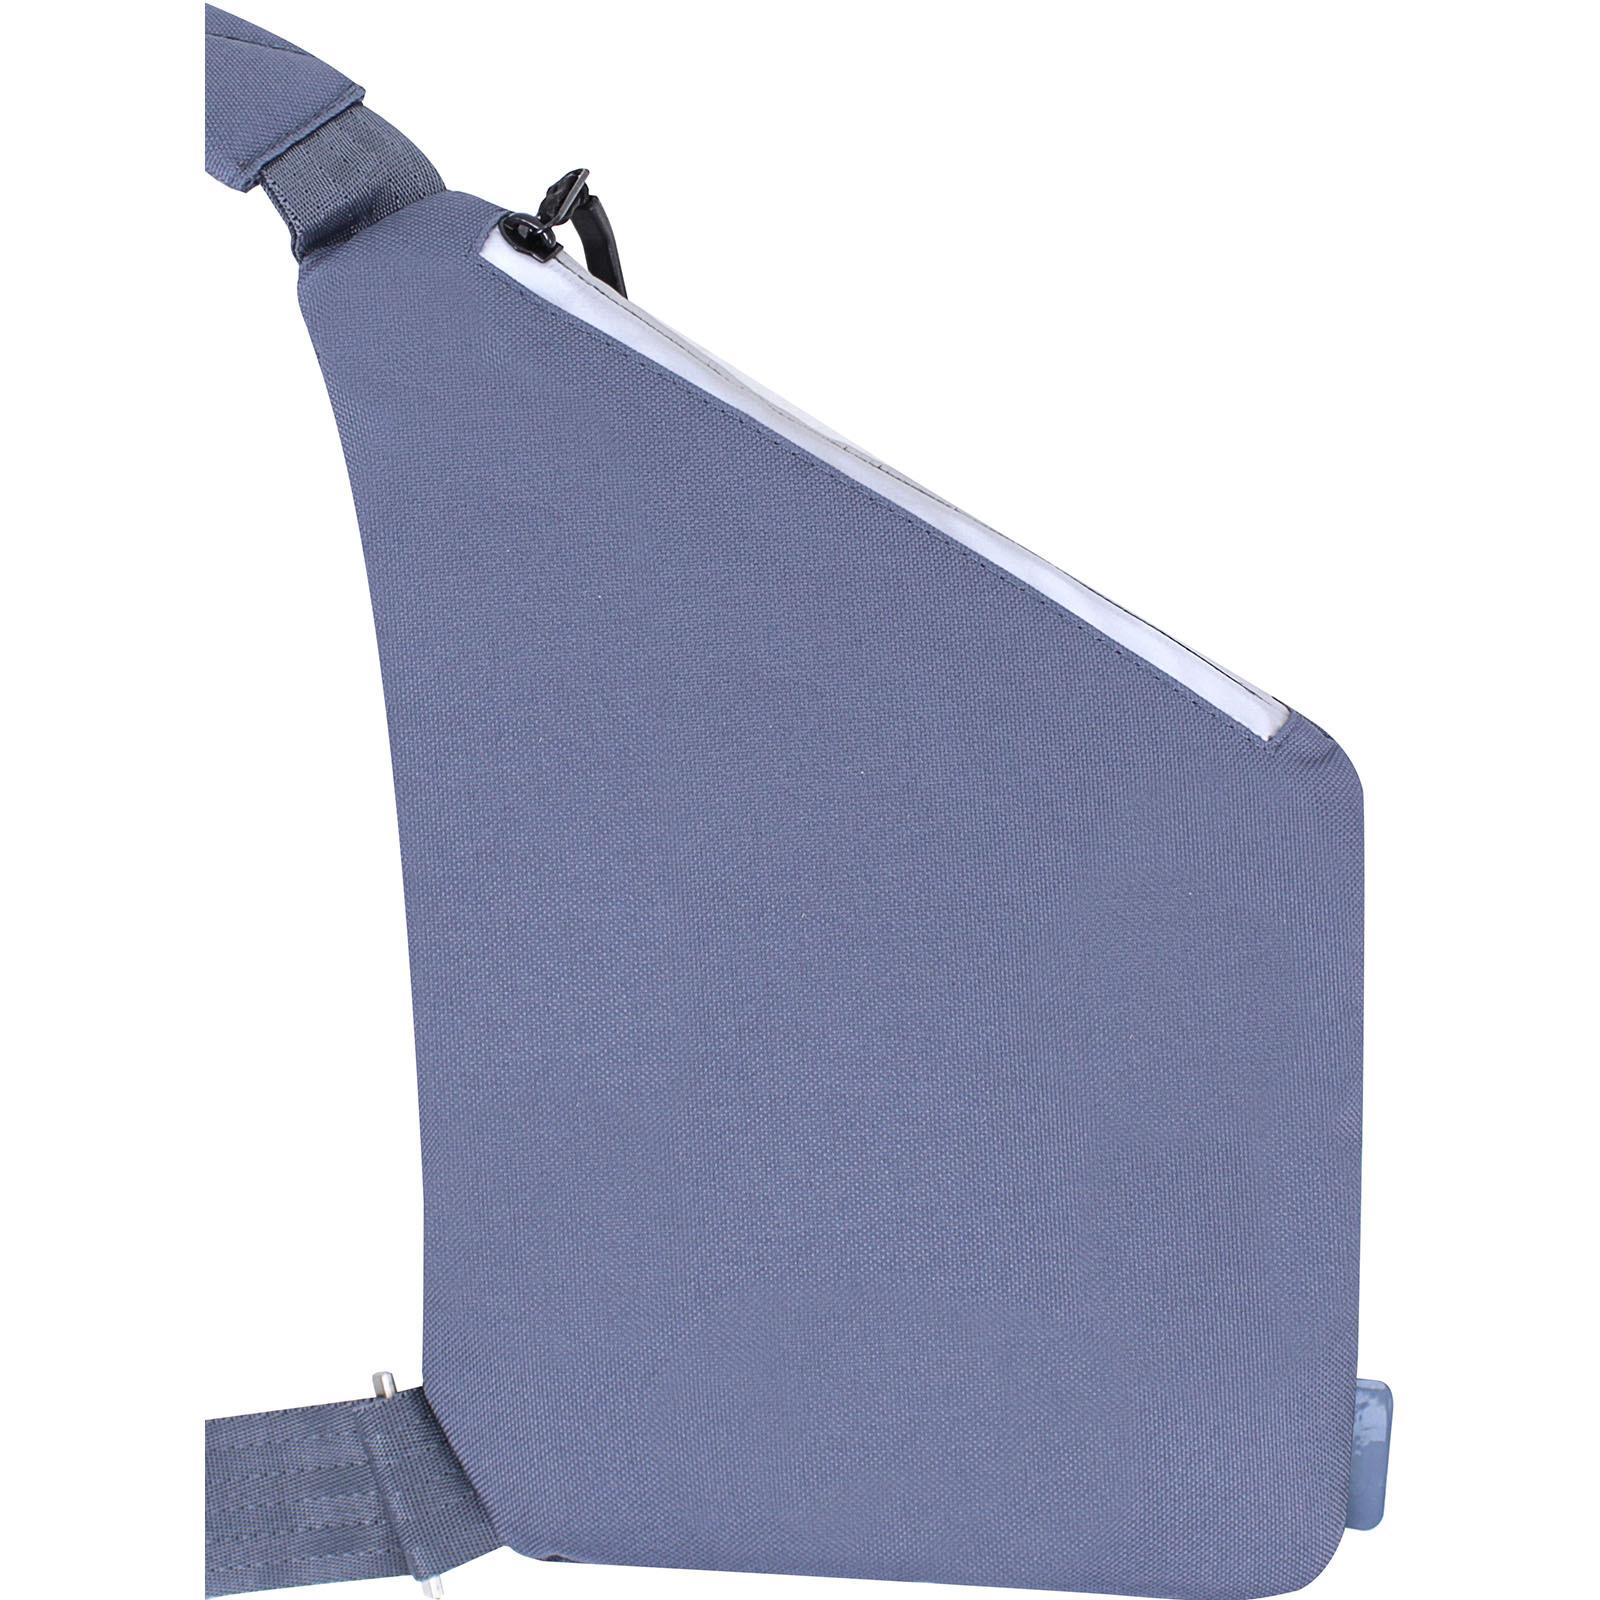 Сумка-мессенджер Bagland Triangle 3 л. серый (0021066)